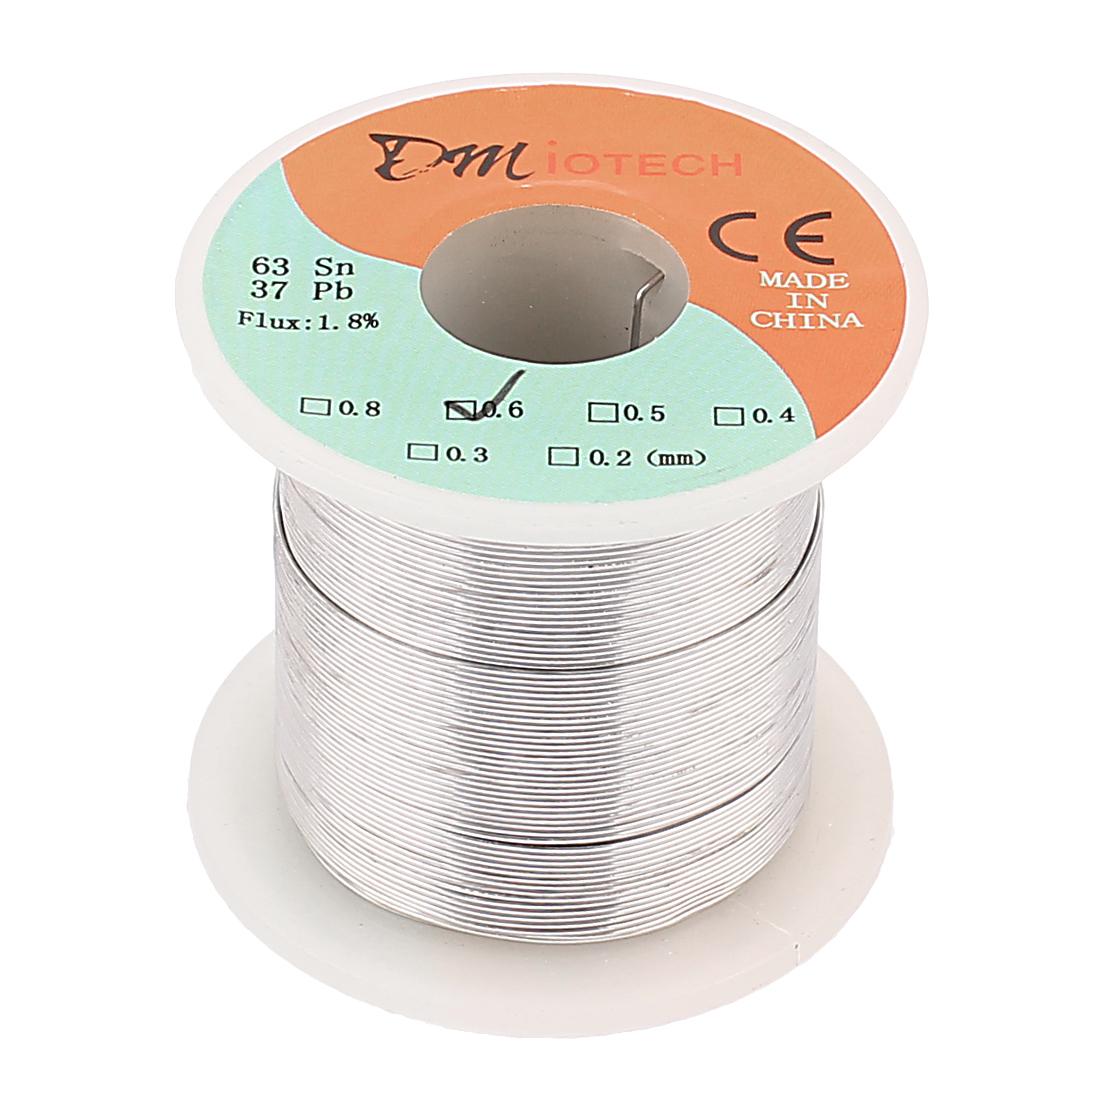 DMiotech 0.6mm 200G 63/37 Rosin Core Flux 1.8% Tin  Roll Soldering Wire